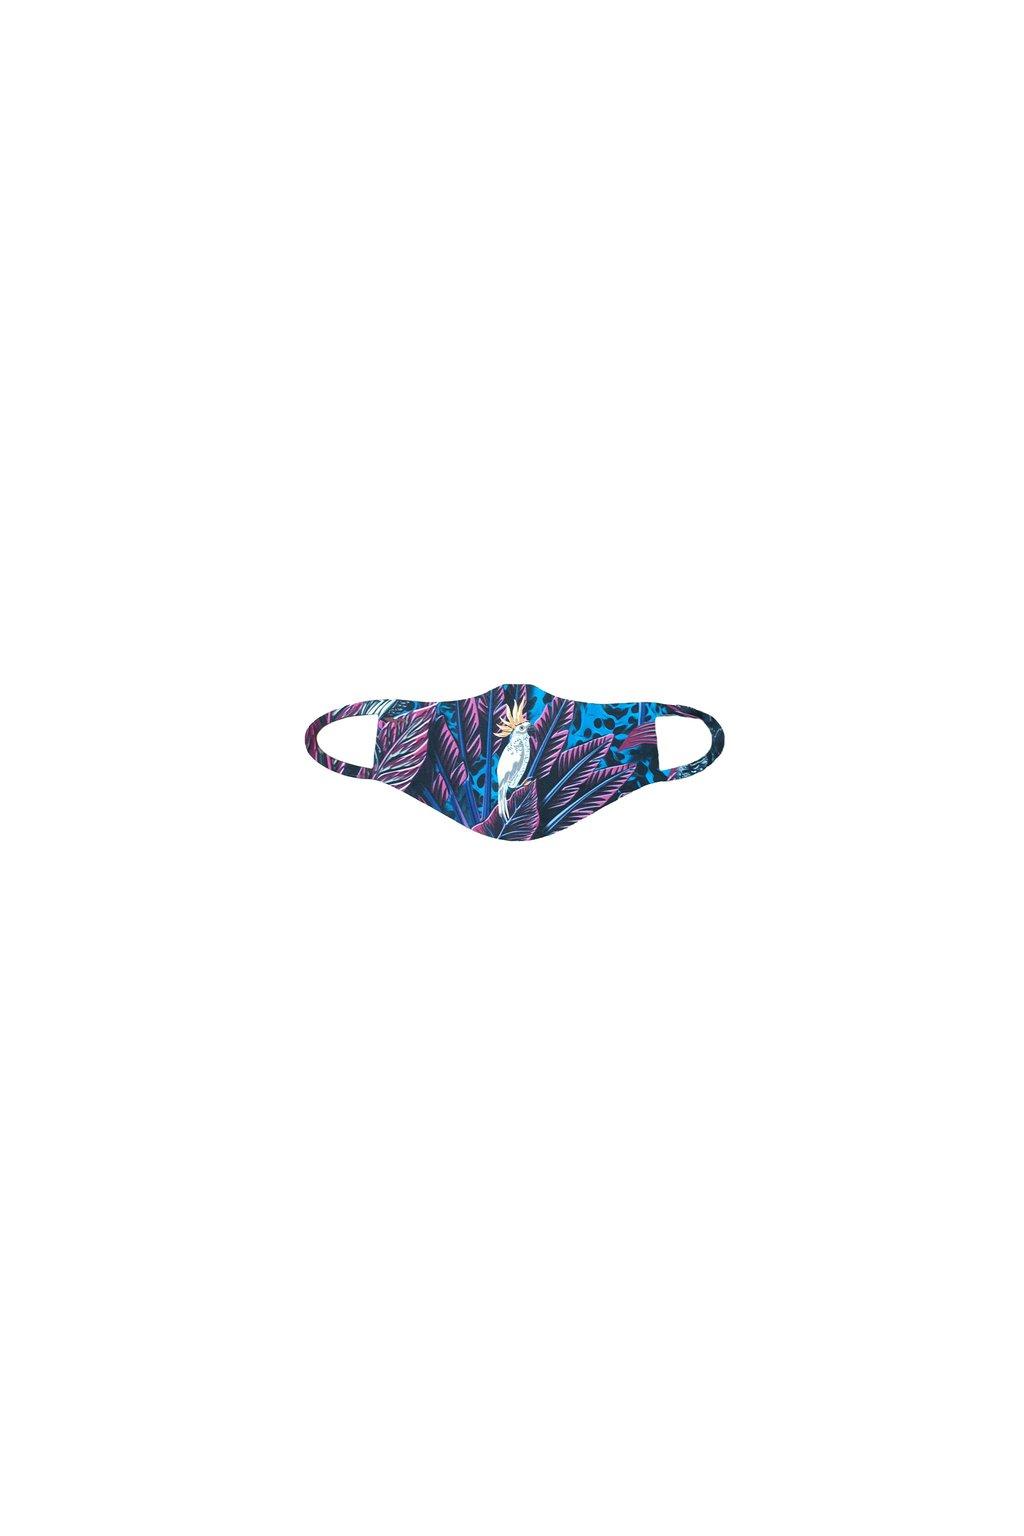 Maska Higieniczna Selva Blue MOH 11T3 18144 679x706